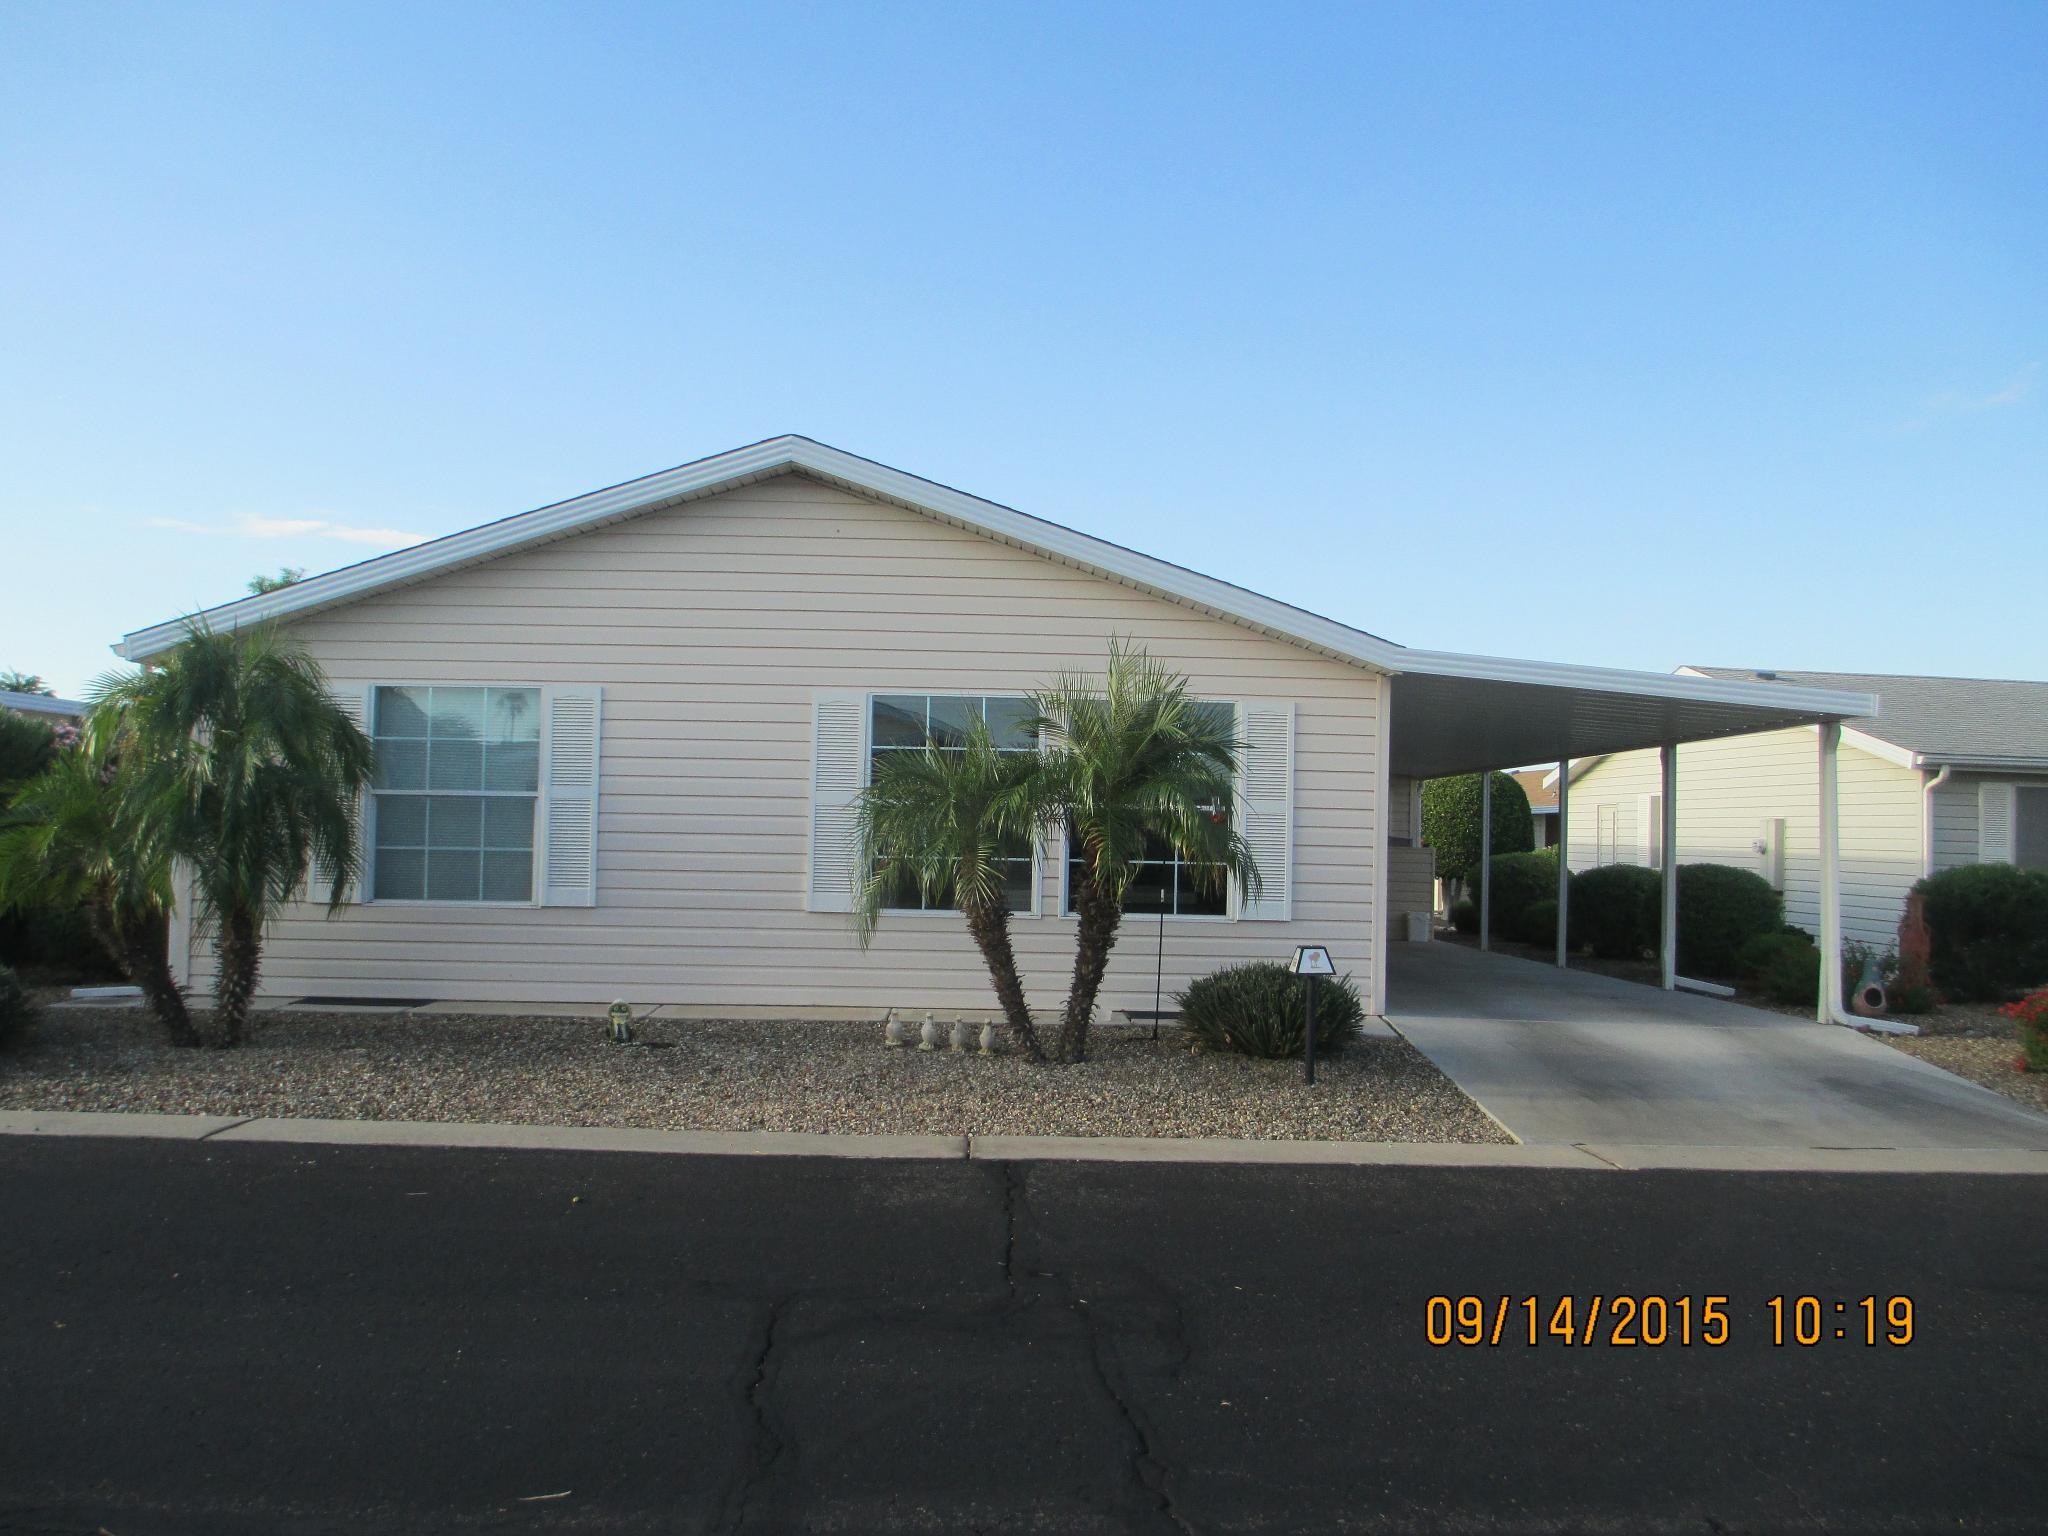 2550 S Ellsworth Rd Mesa AZ Estimate and Home Details